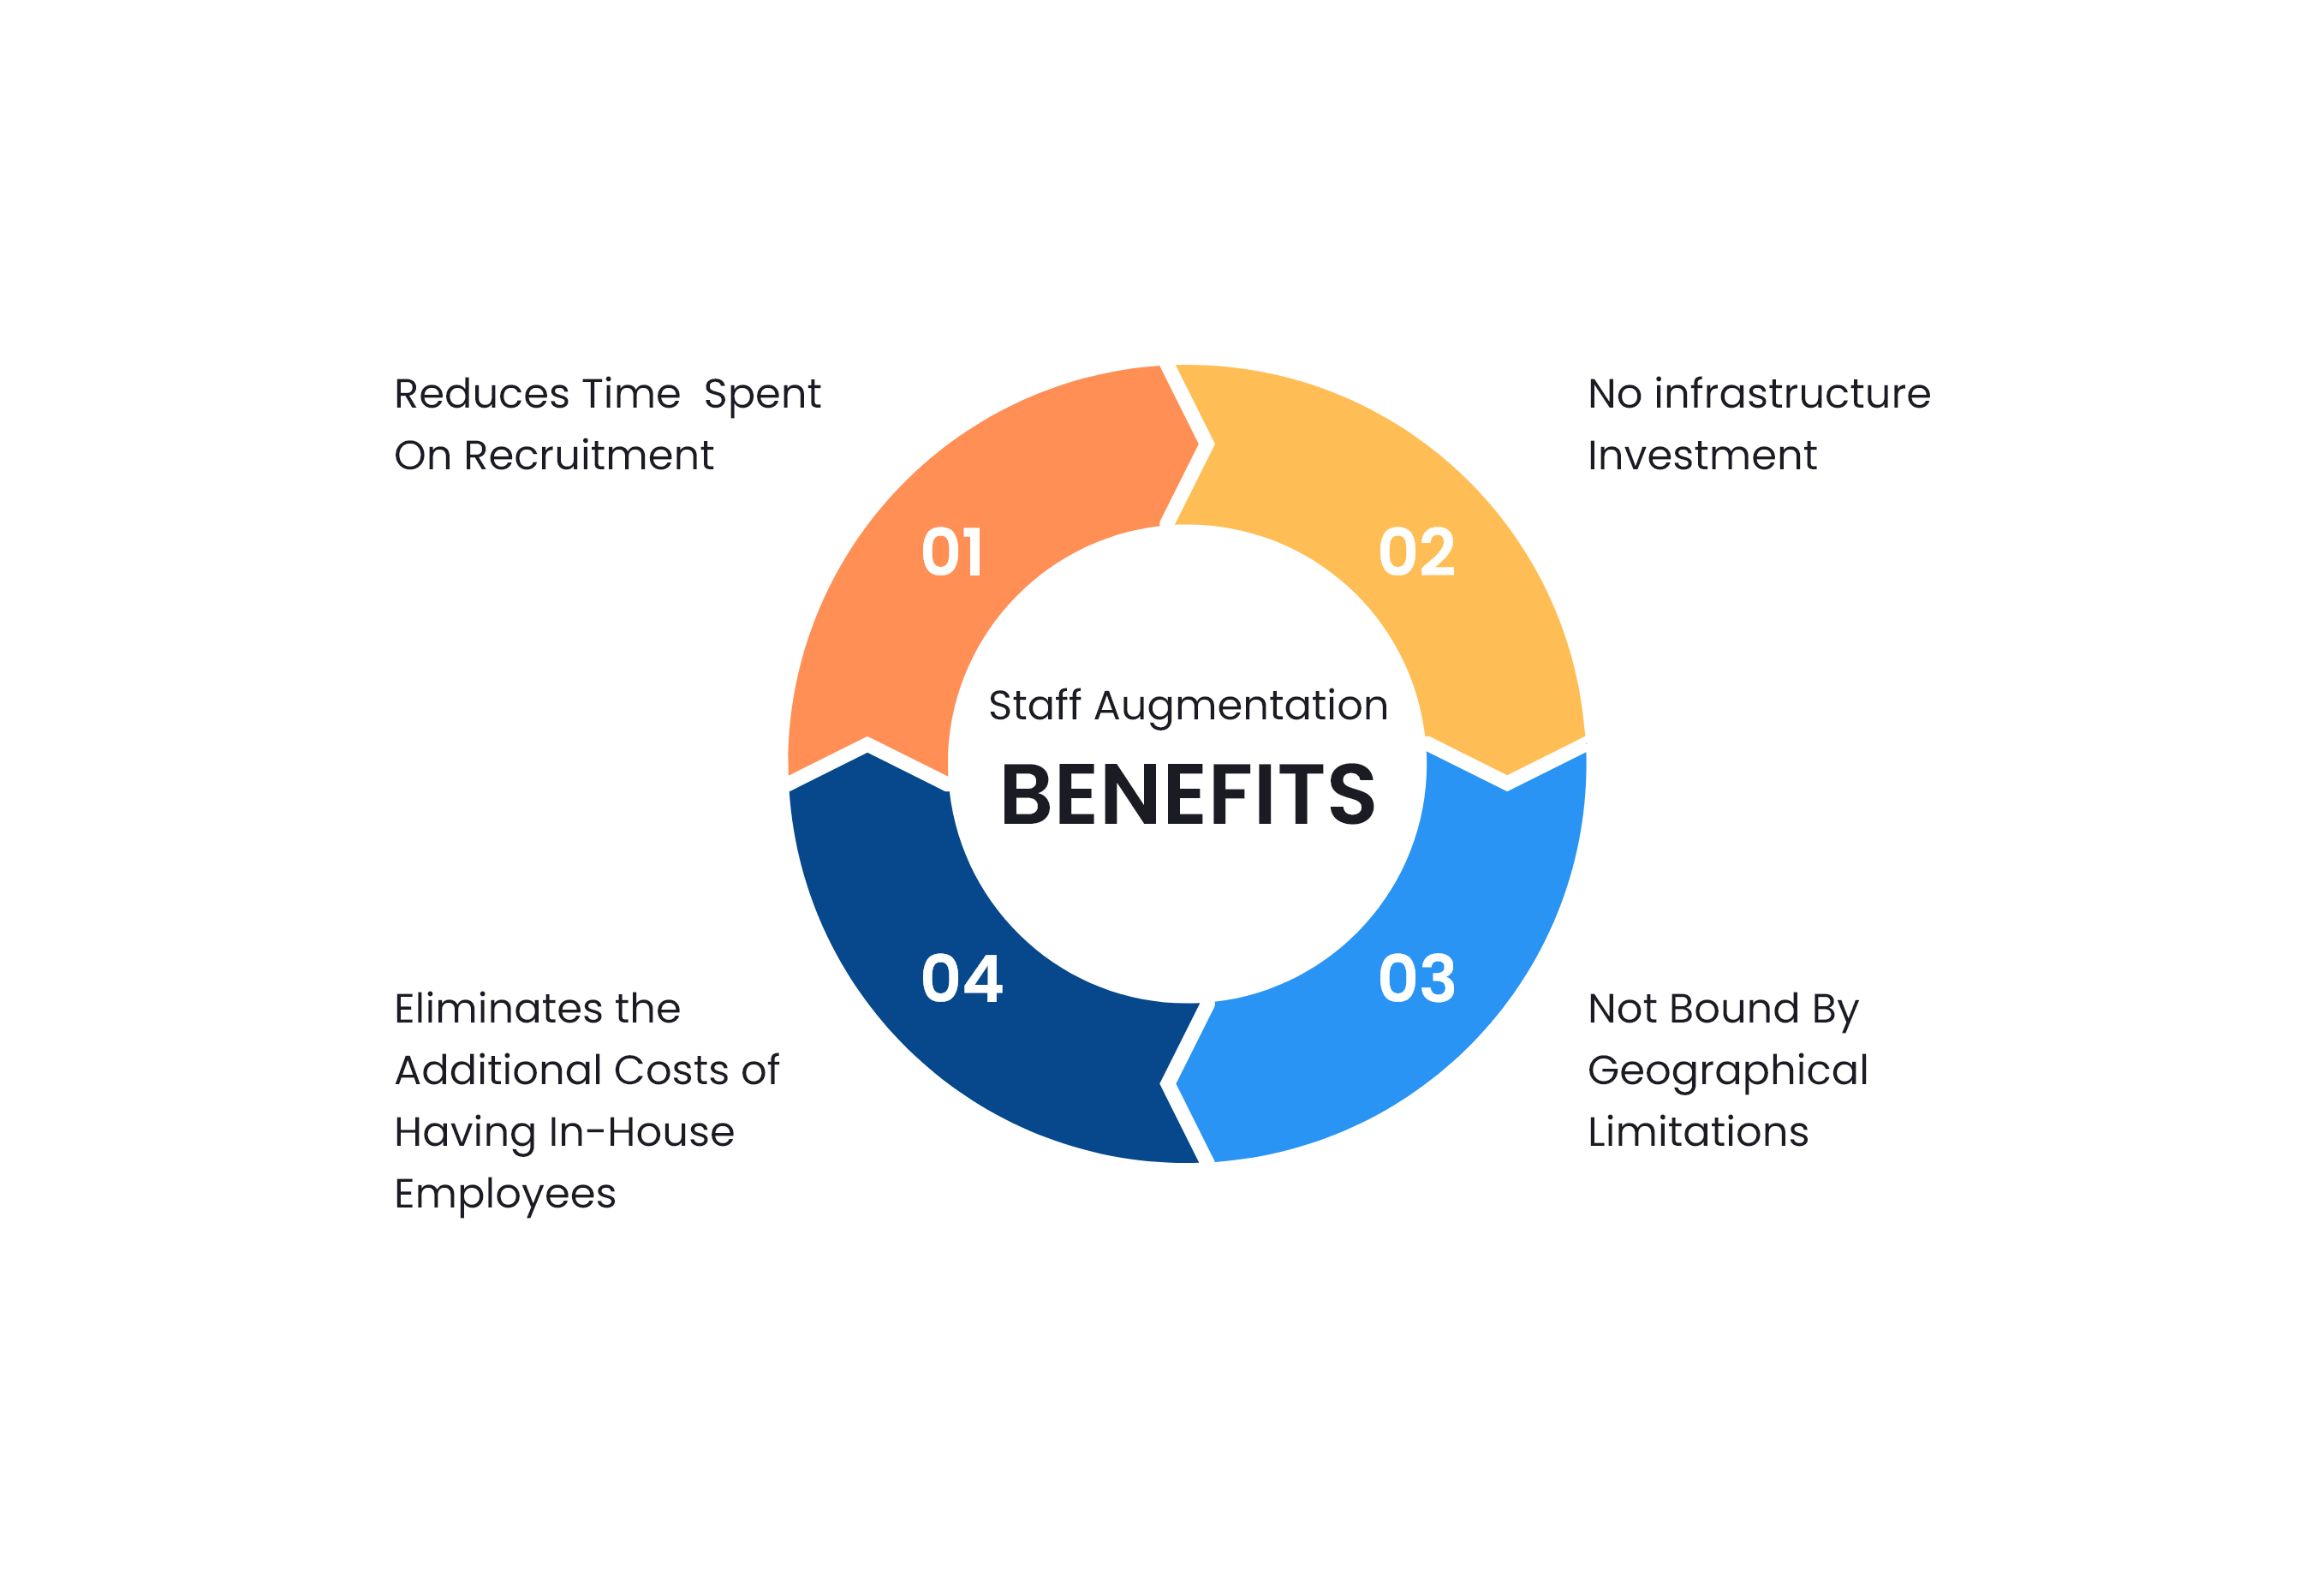 Benefits of Staff Augmentation